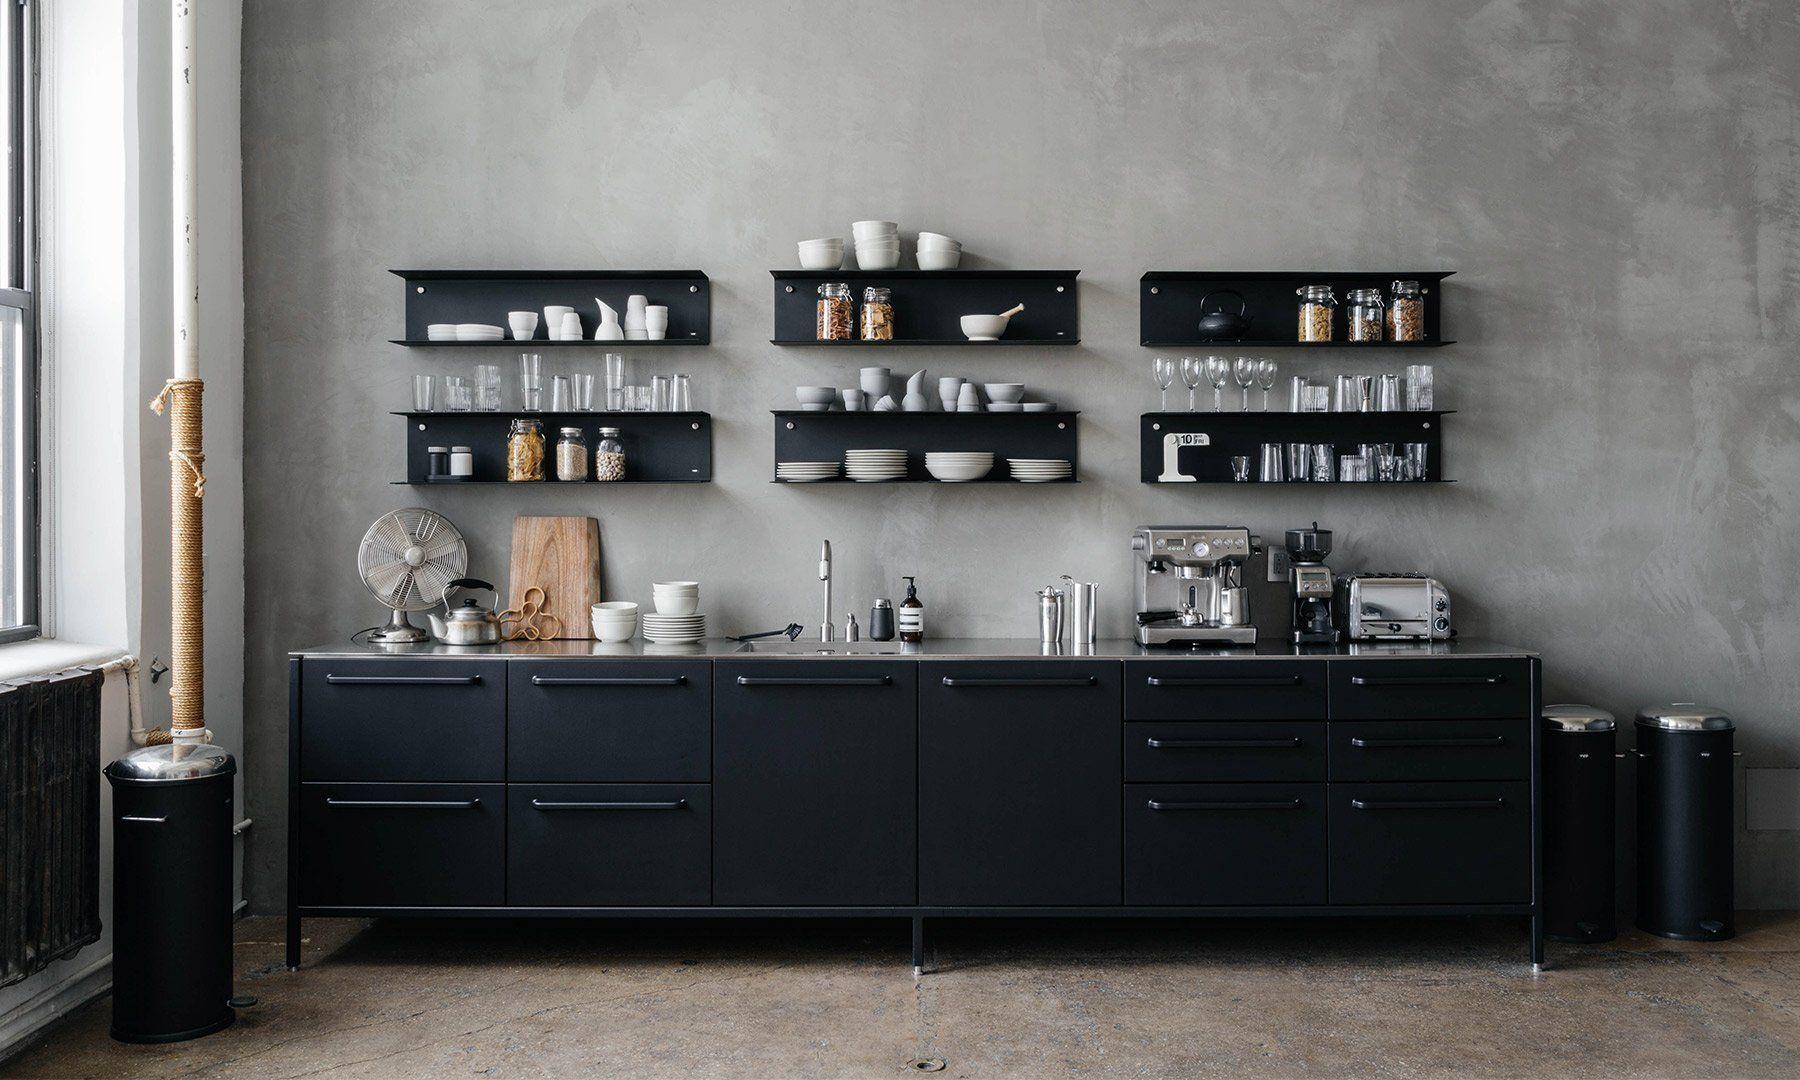 Trend Alert 8 Companies Designing Modular Kitchen Components Remodelista Kitchen Design Companies Home Kitchens Kitchen Cabinet Remodel